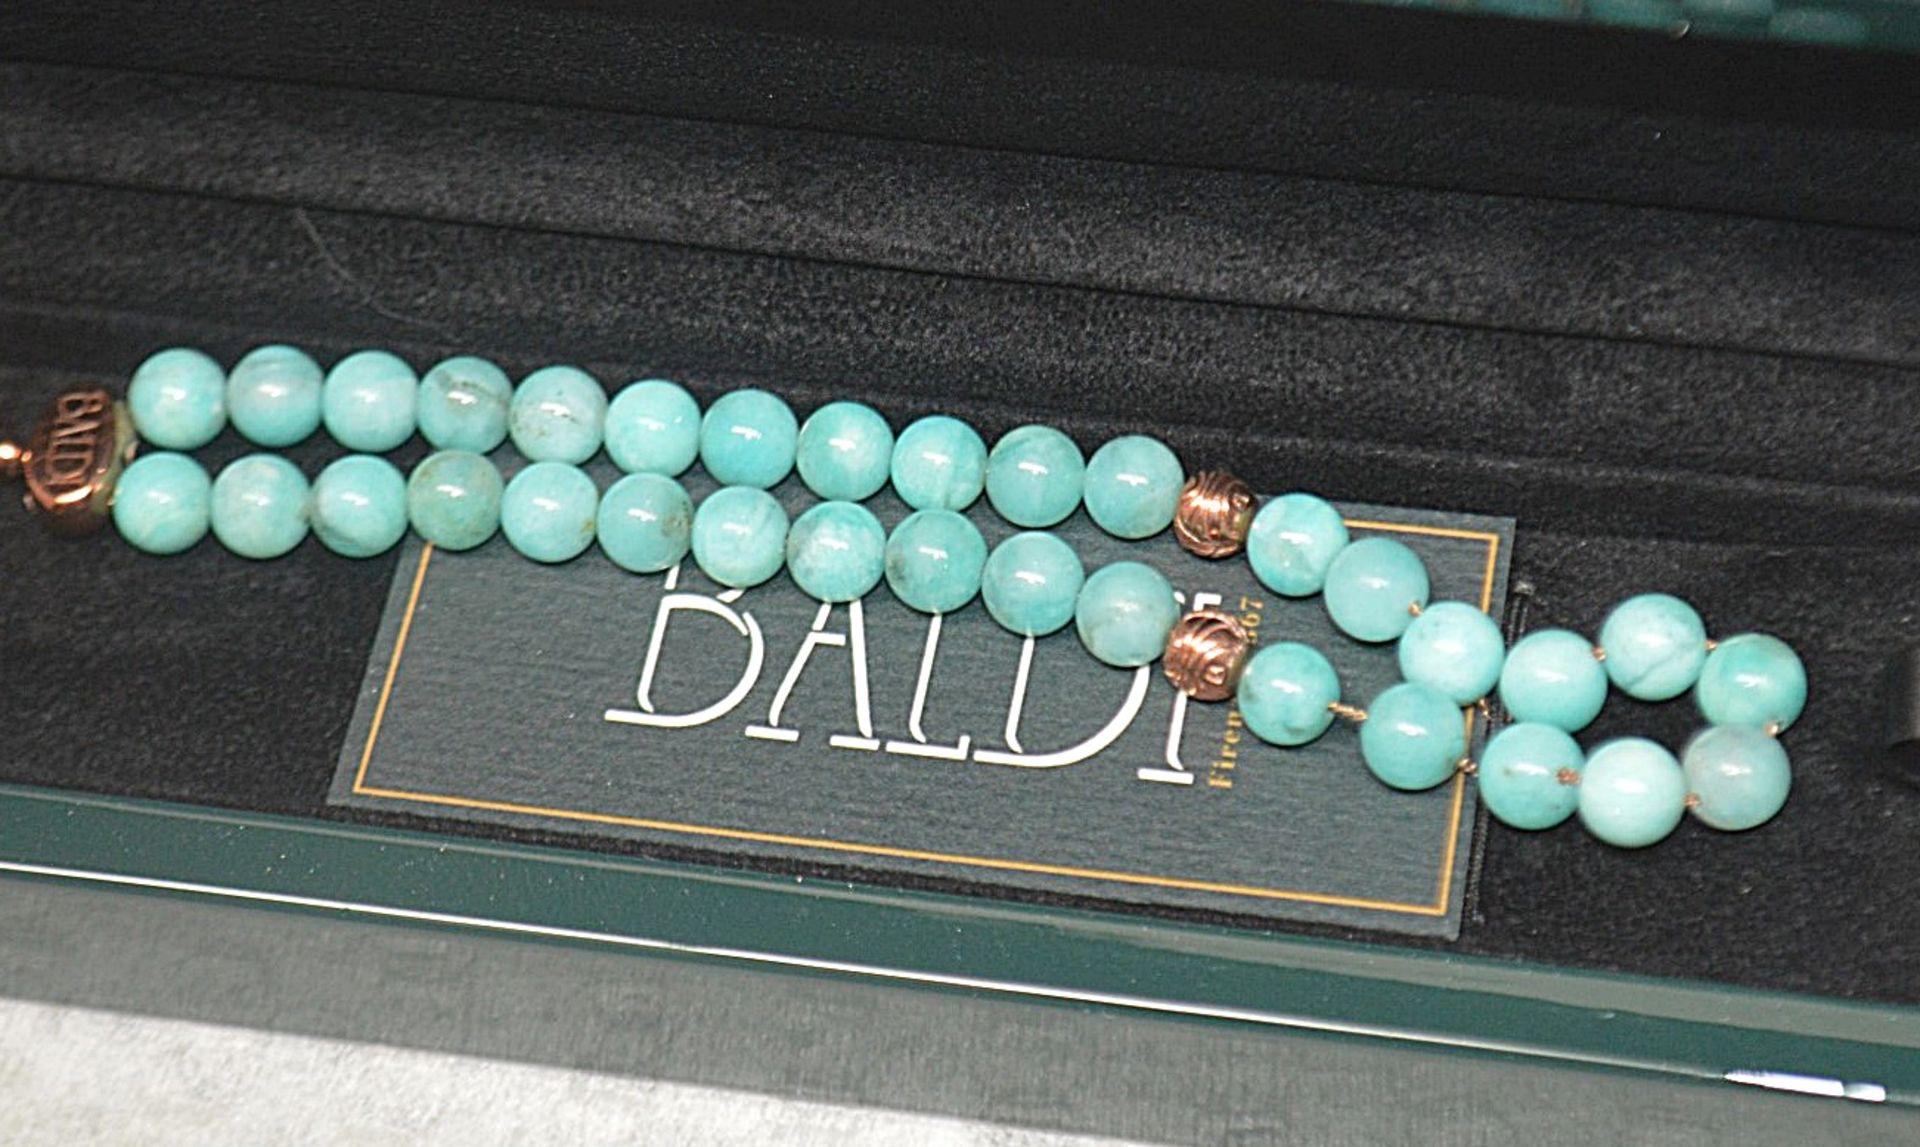 1 x BALDI 'Home Jewels' Italian Hand-crafted Artisan MISBAHA Prayer Beads In Amazonite Gemstone - Image 2 of 7